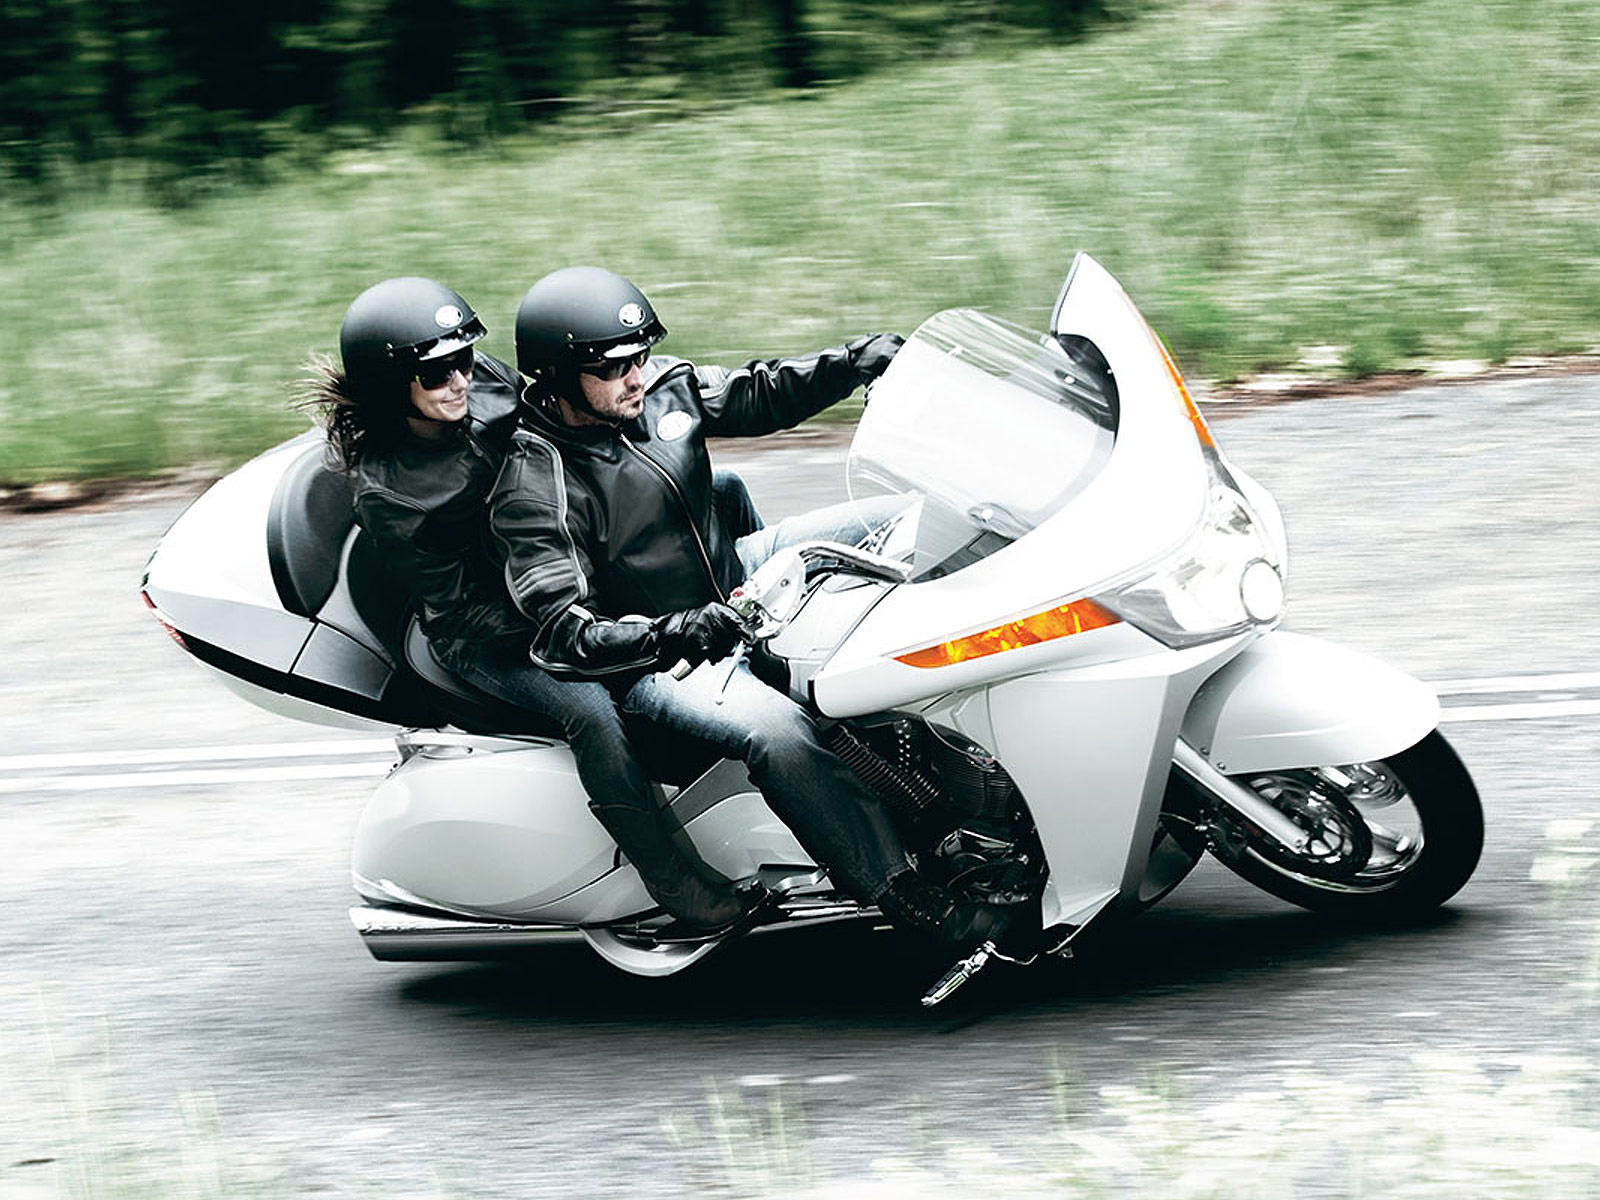 http://4.bp.blogspot.com/-8v9d8ur4za8/Tm7ICYkO3AI/AAAAAAAAA3Y/kaaD3vCuMT0/s1600/Victory-Vision-Tour_2010_motorcycle-desktop-wallpaper_2.jpg